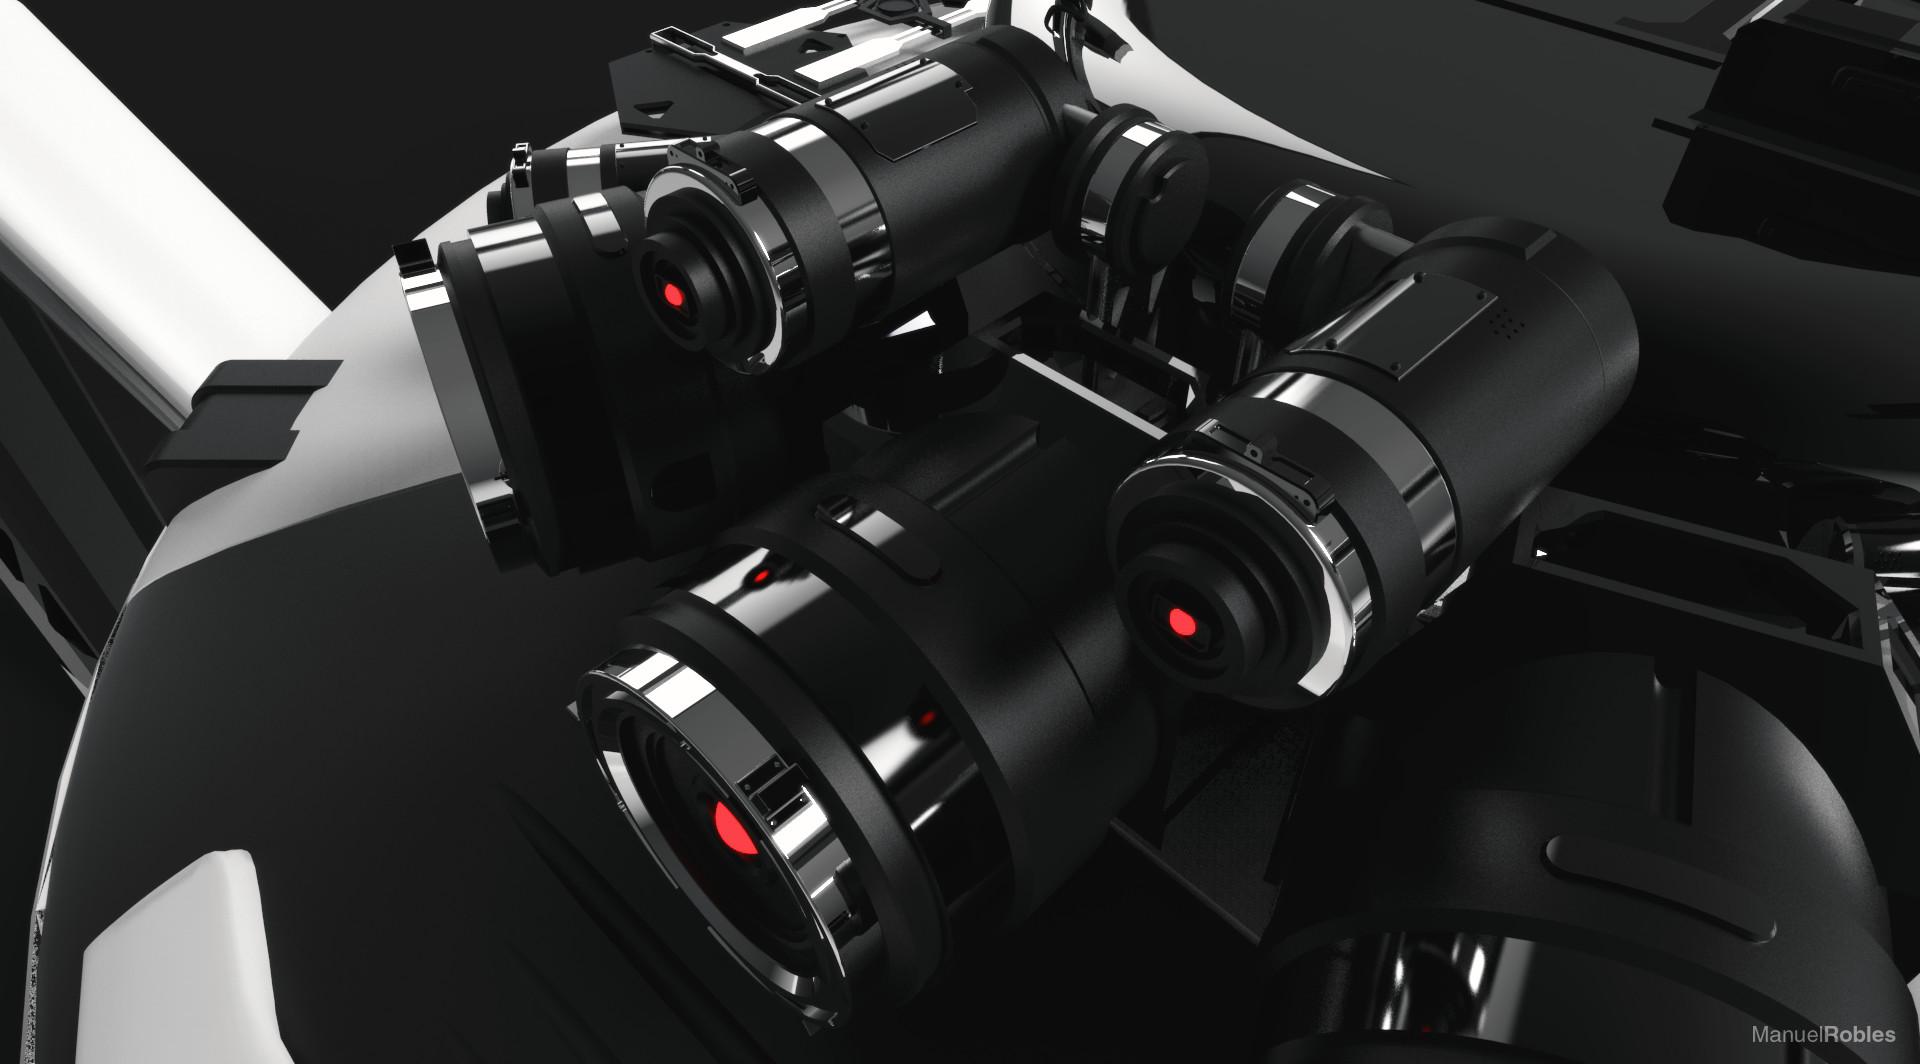 Manuel robles spider robotdron 02 viewset 30